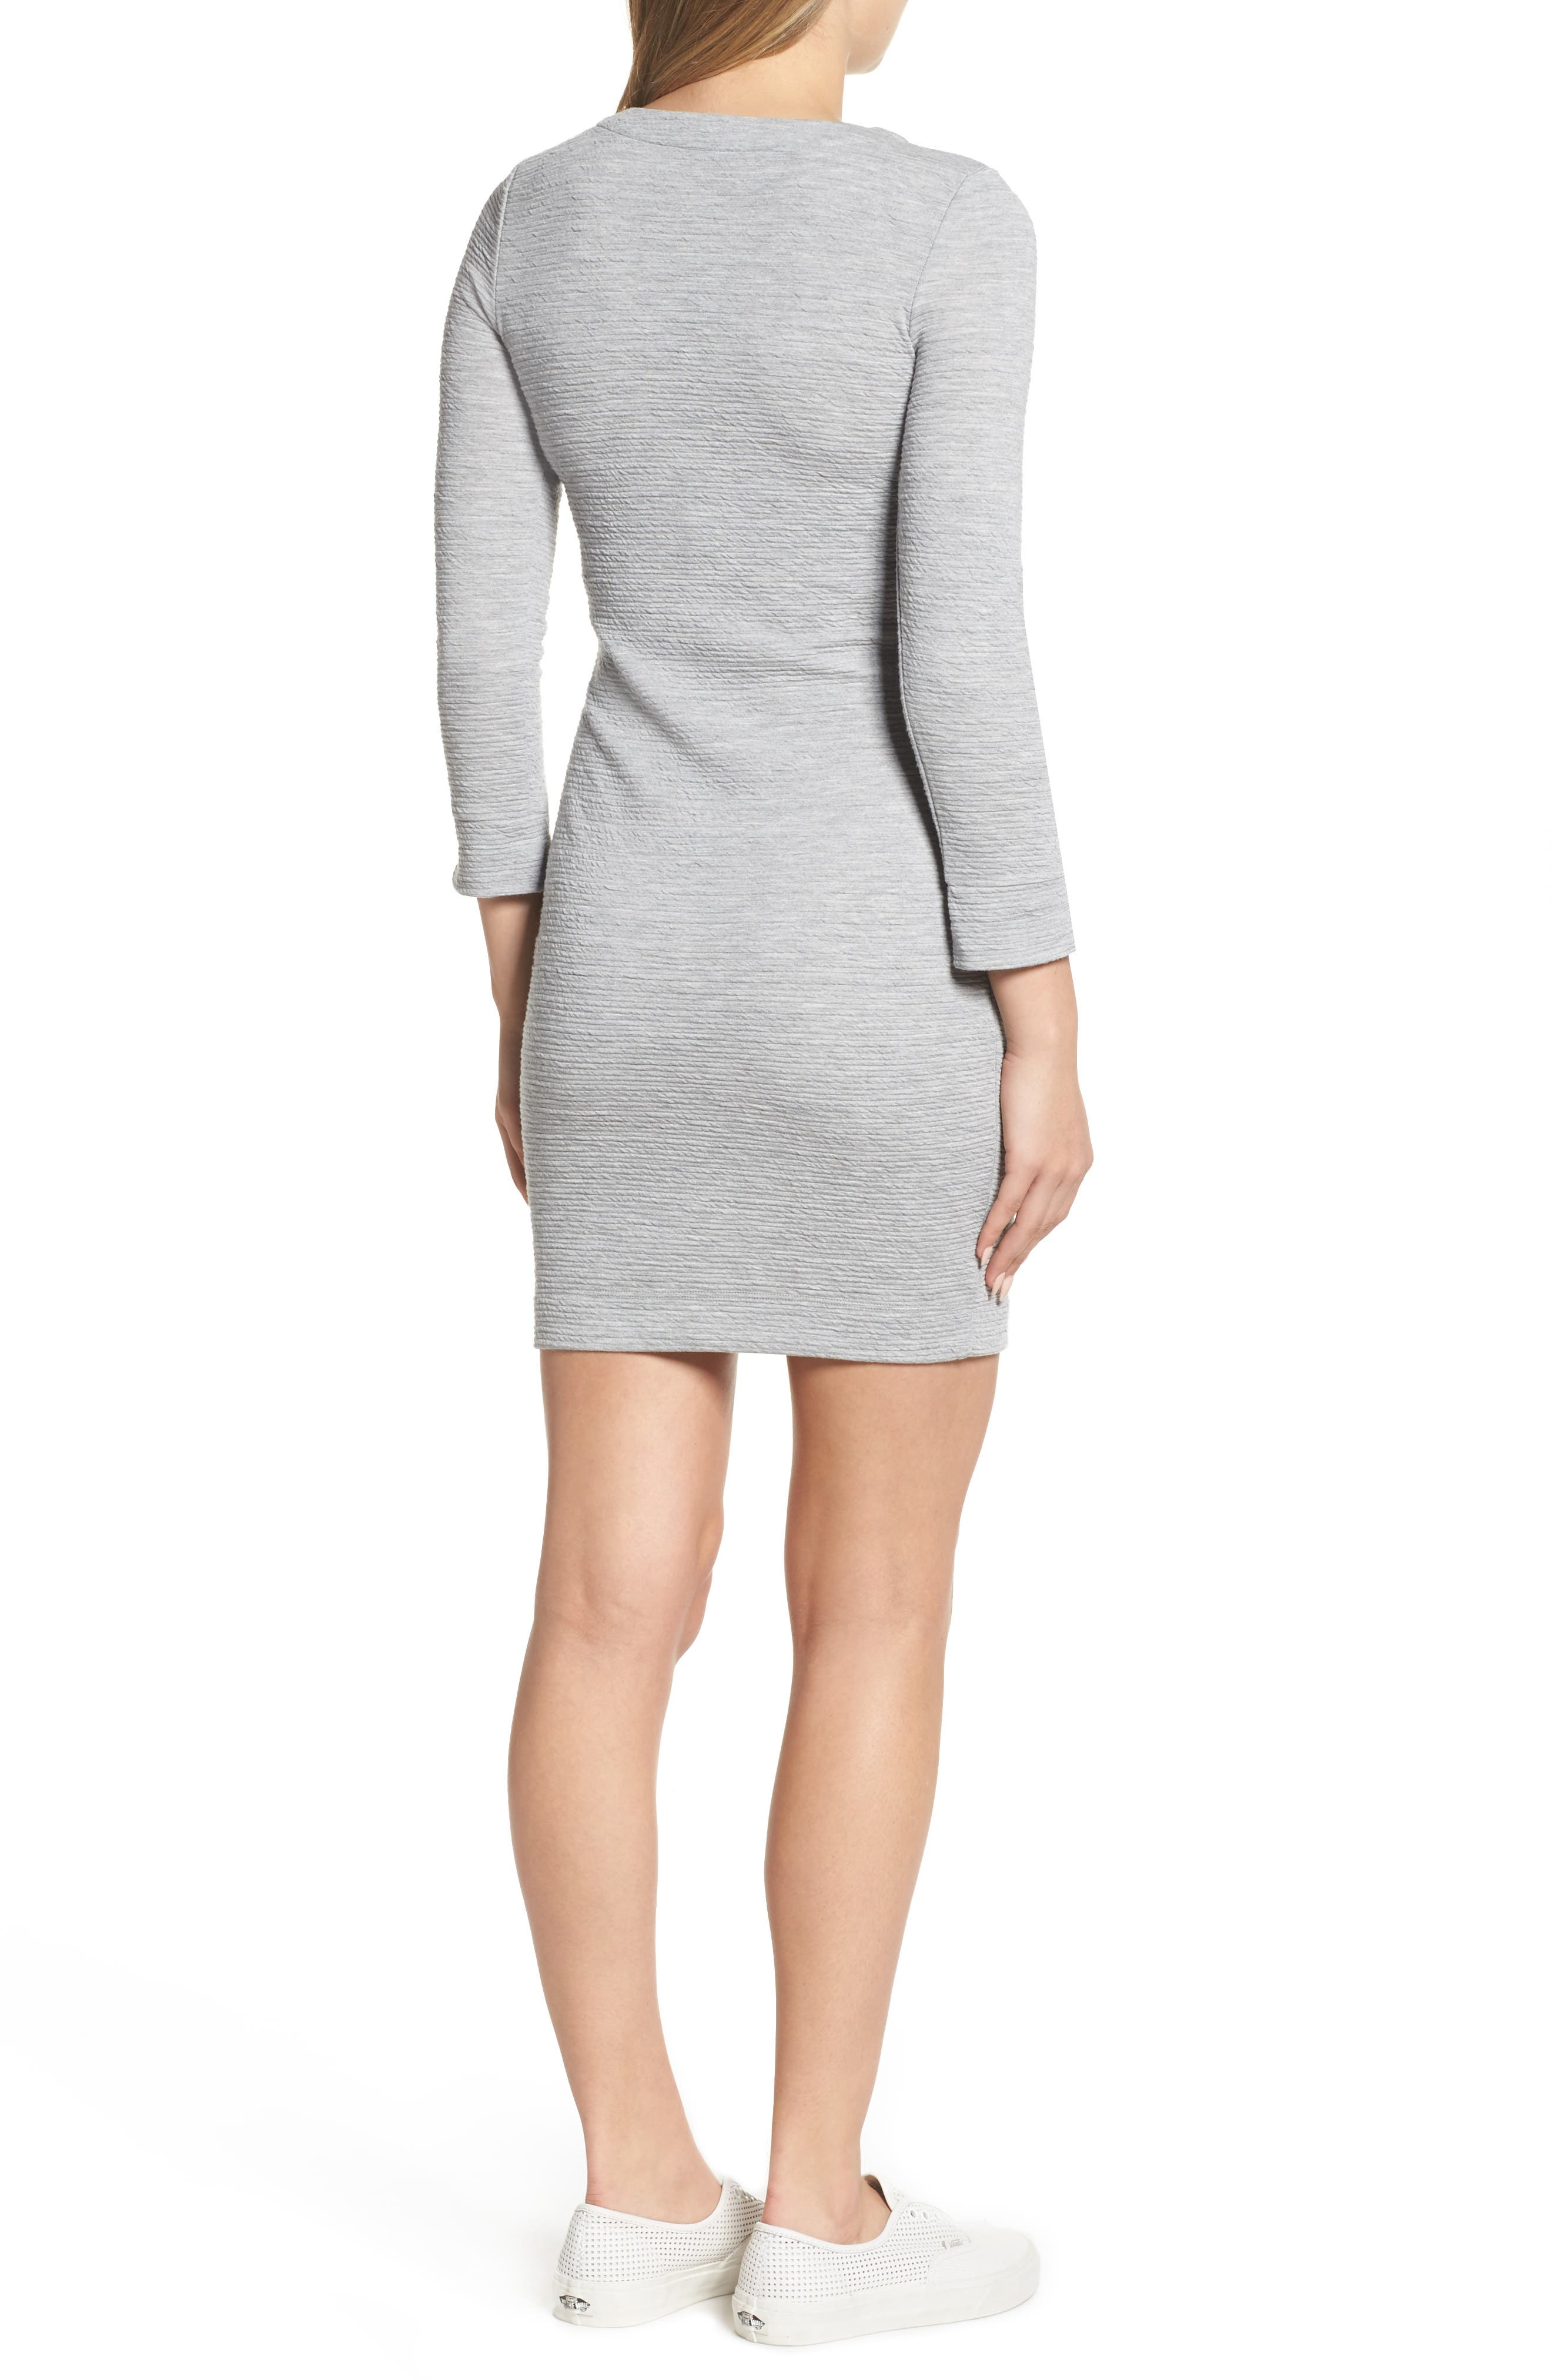 Sudan Marl Sheath Dress,                             Alternate thumbnail 2, color,                             Mid Grey Mel